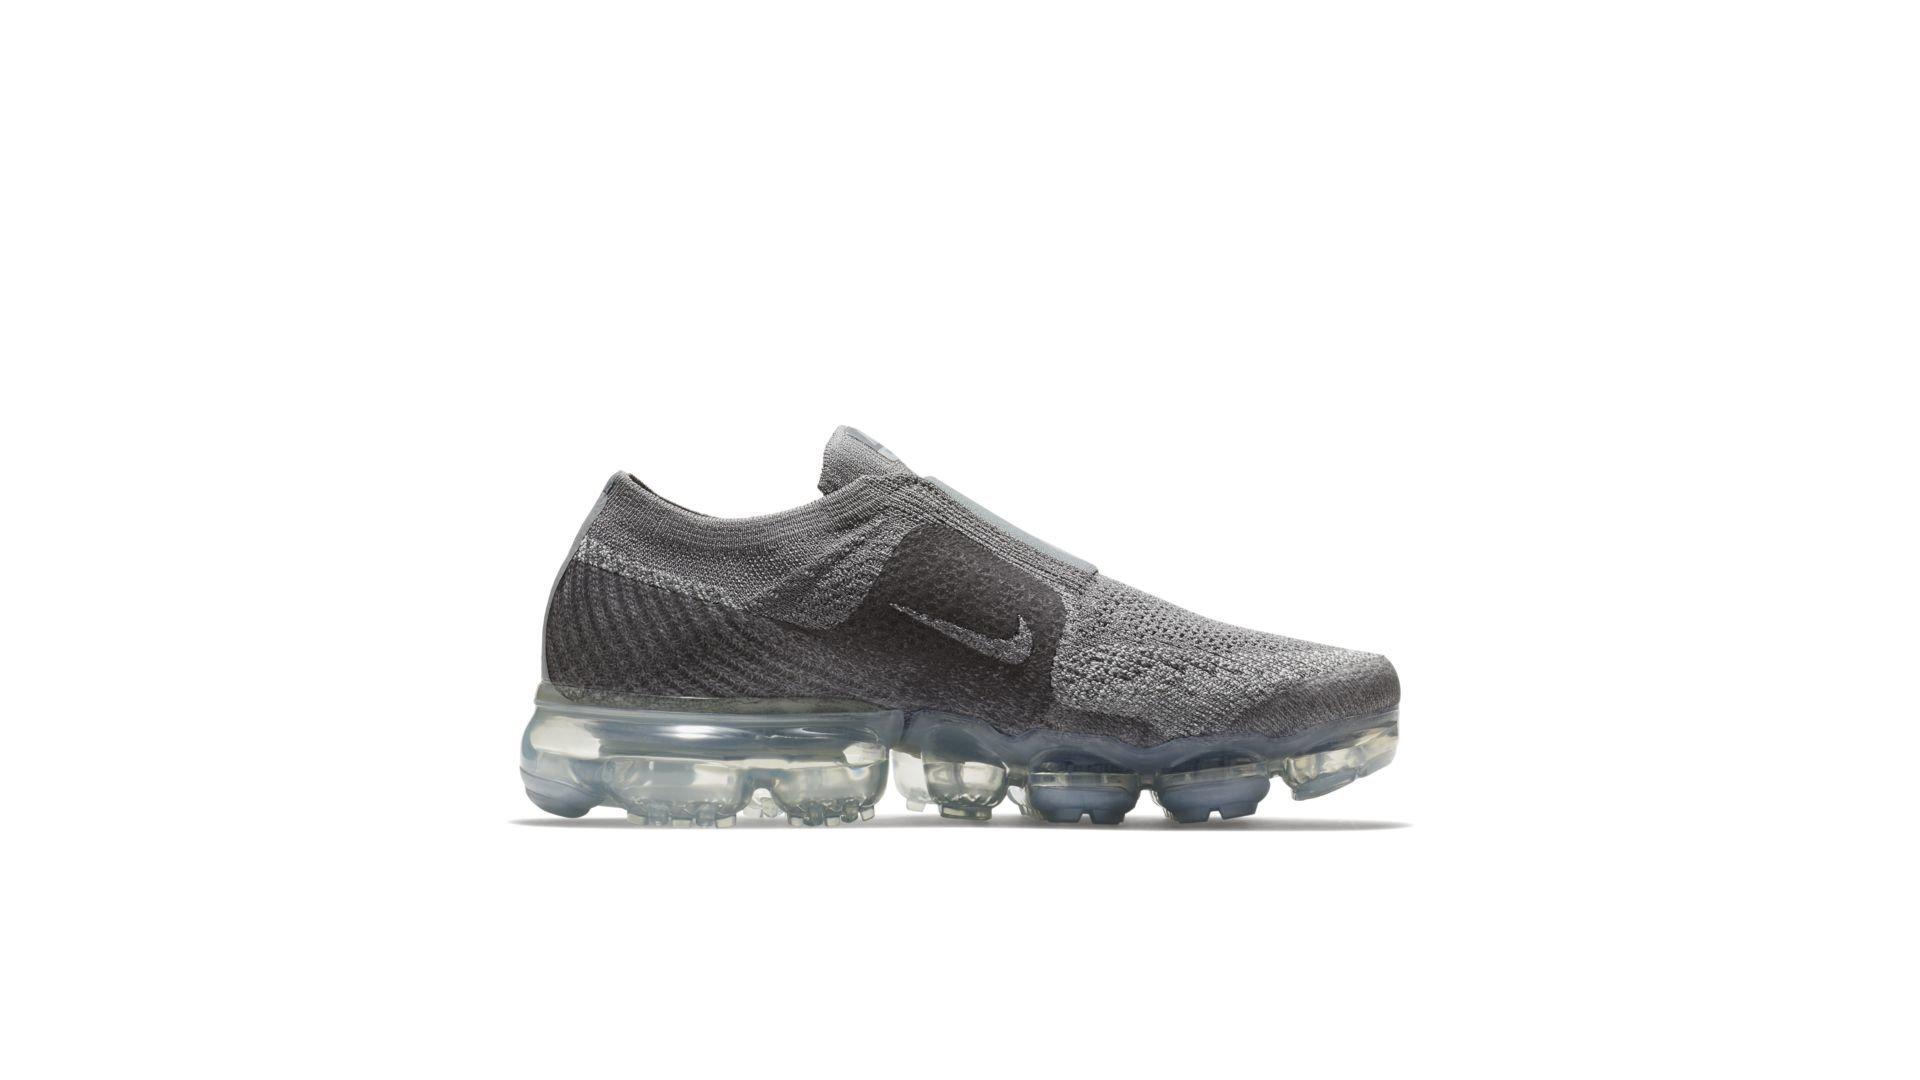 Nike Air VaporMax Moc Cool Grey (W) (AA4155-006)